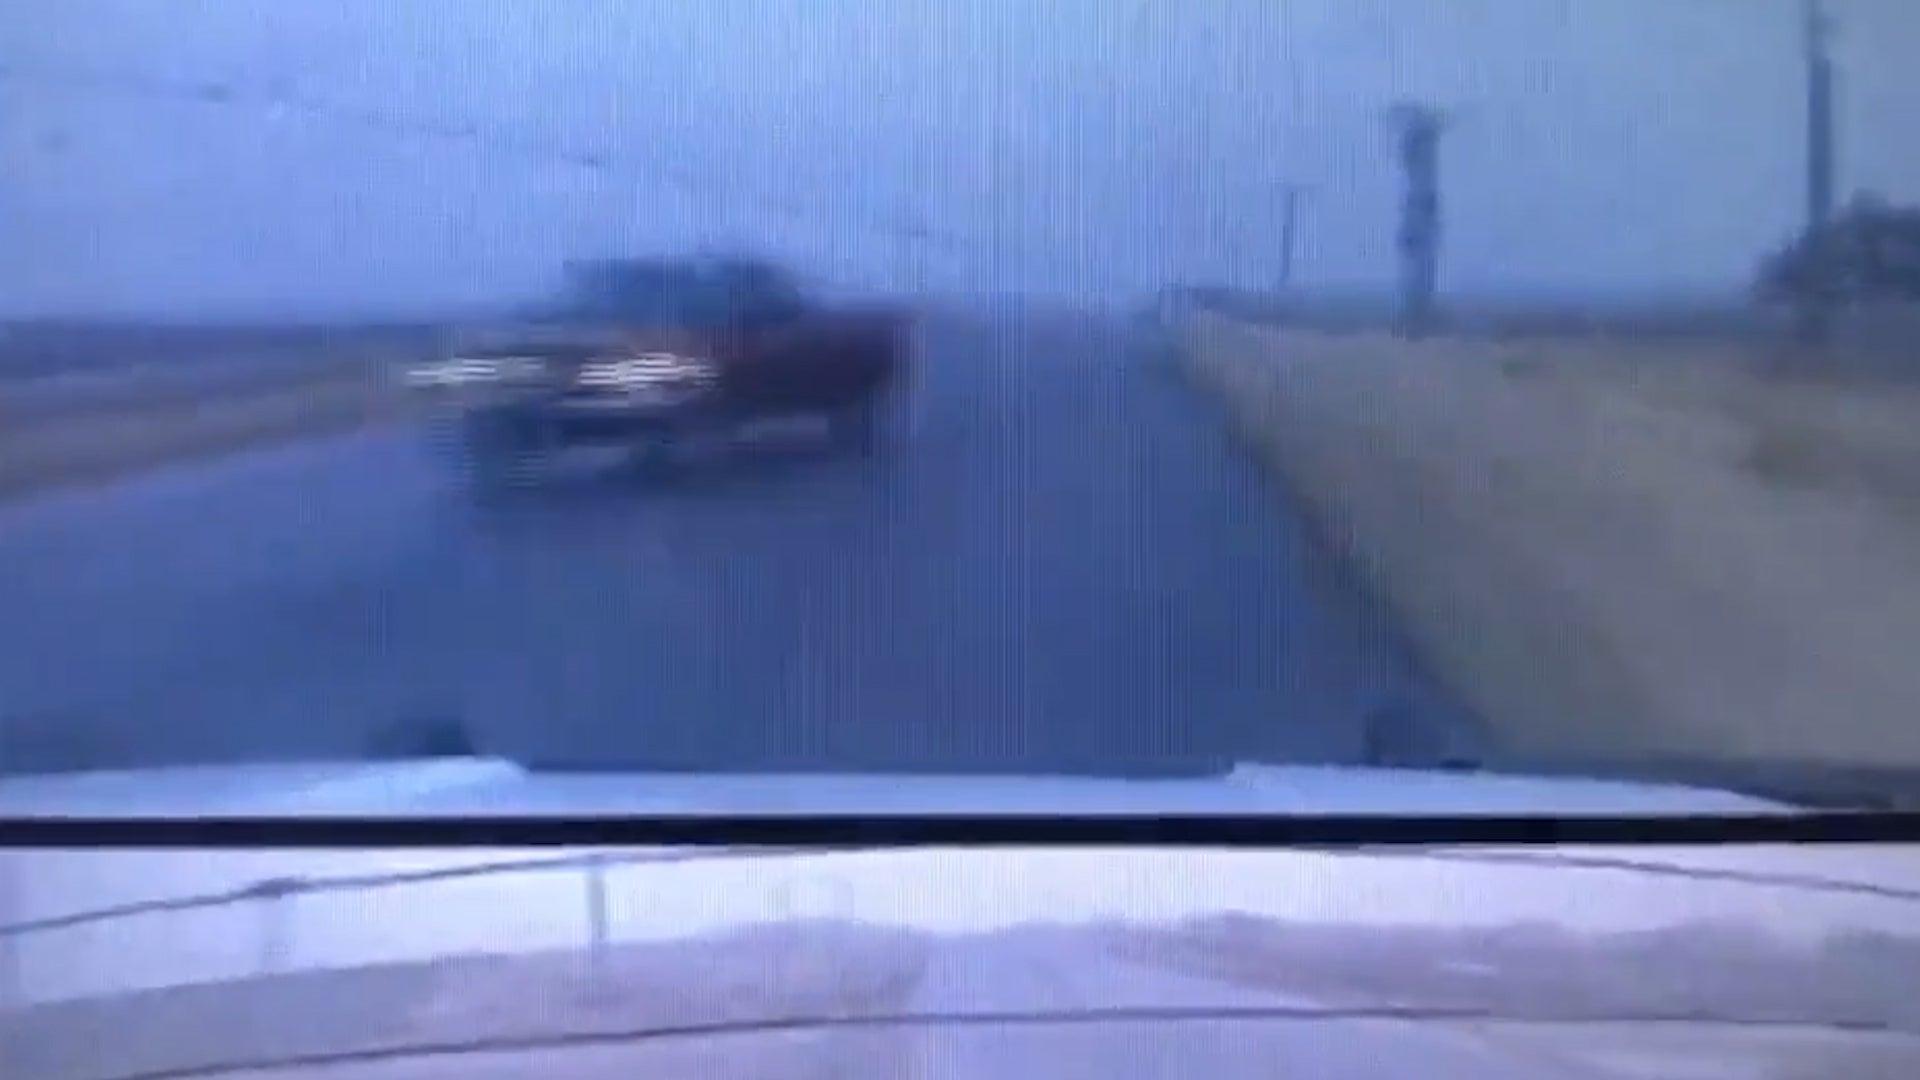 Kansas State Trooper Narrowly Avoids Collision on Rainy Road